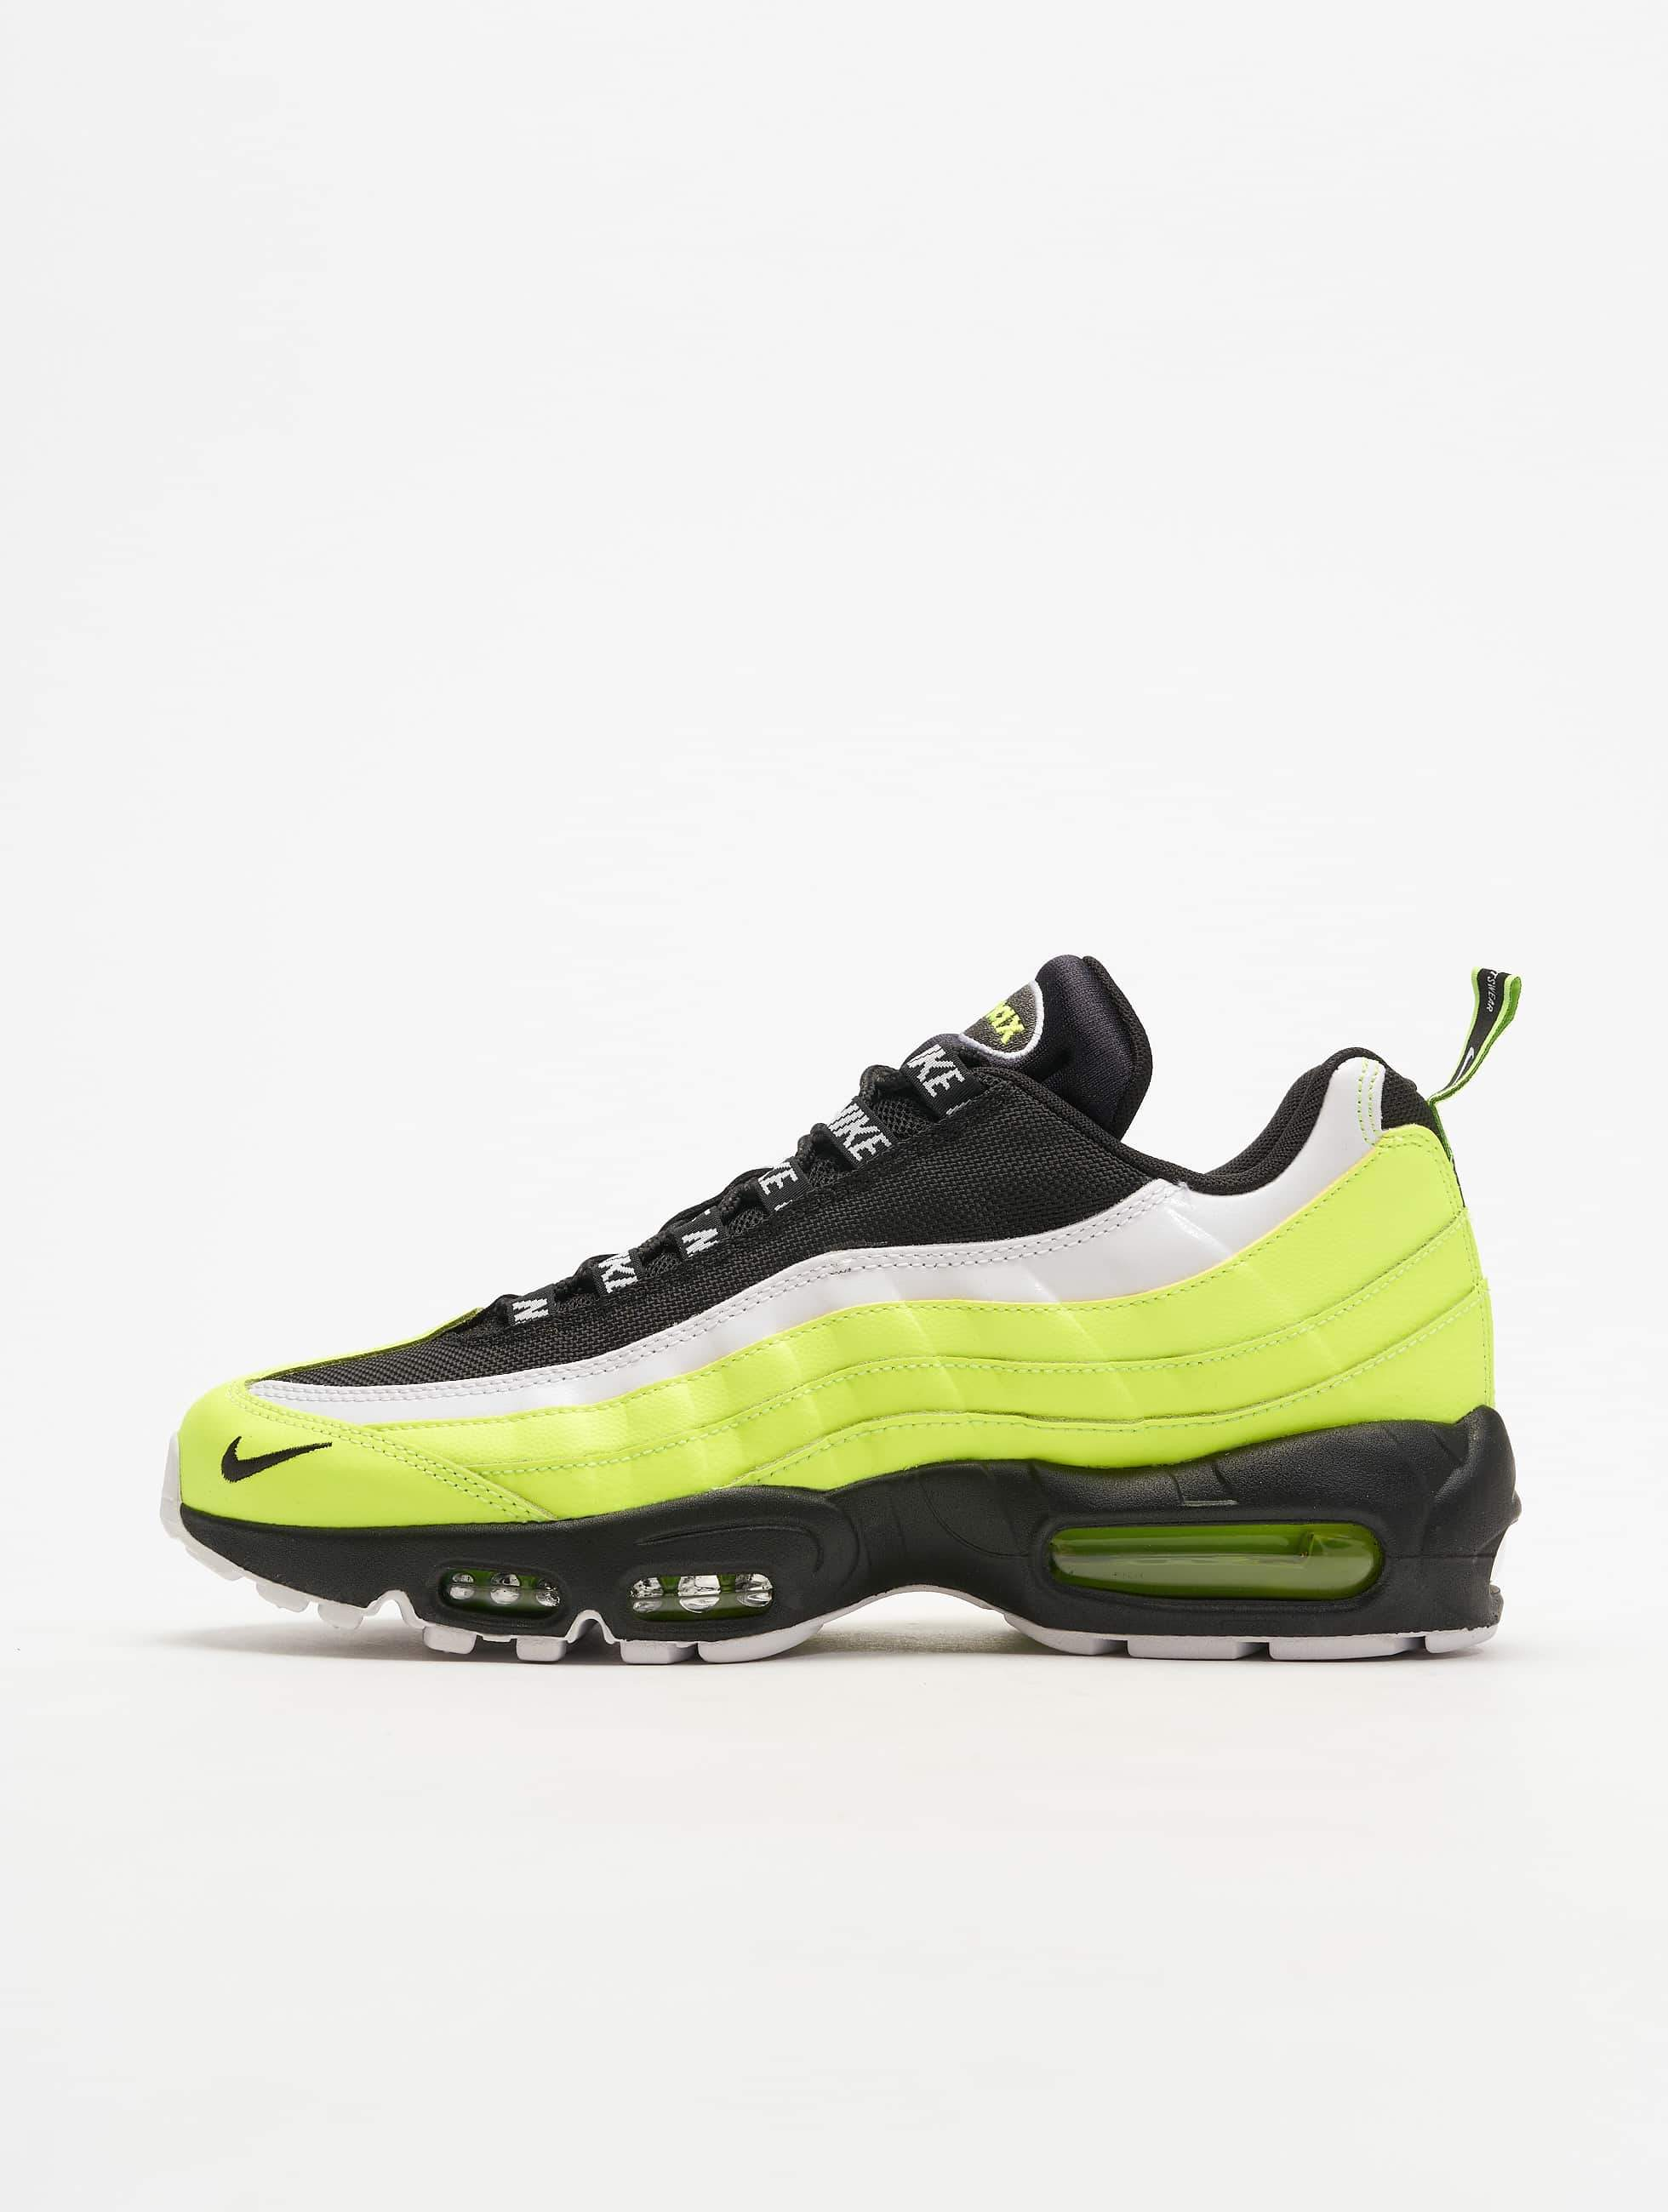 new concept c045b 5bf2e Nike Skor   Sneakers Air Max 95 Premium i gul 539970